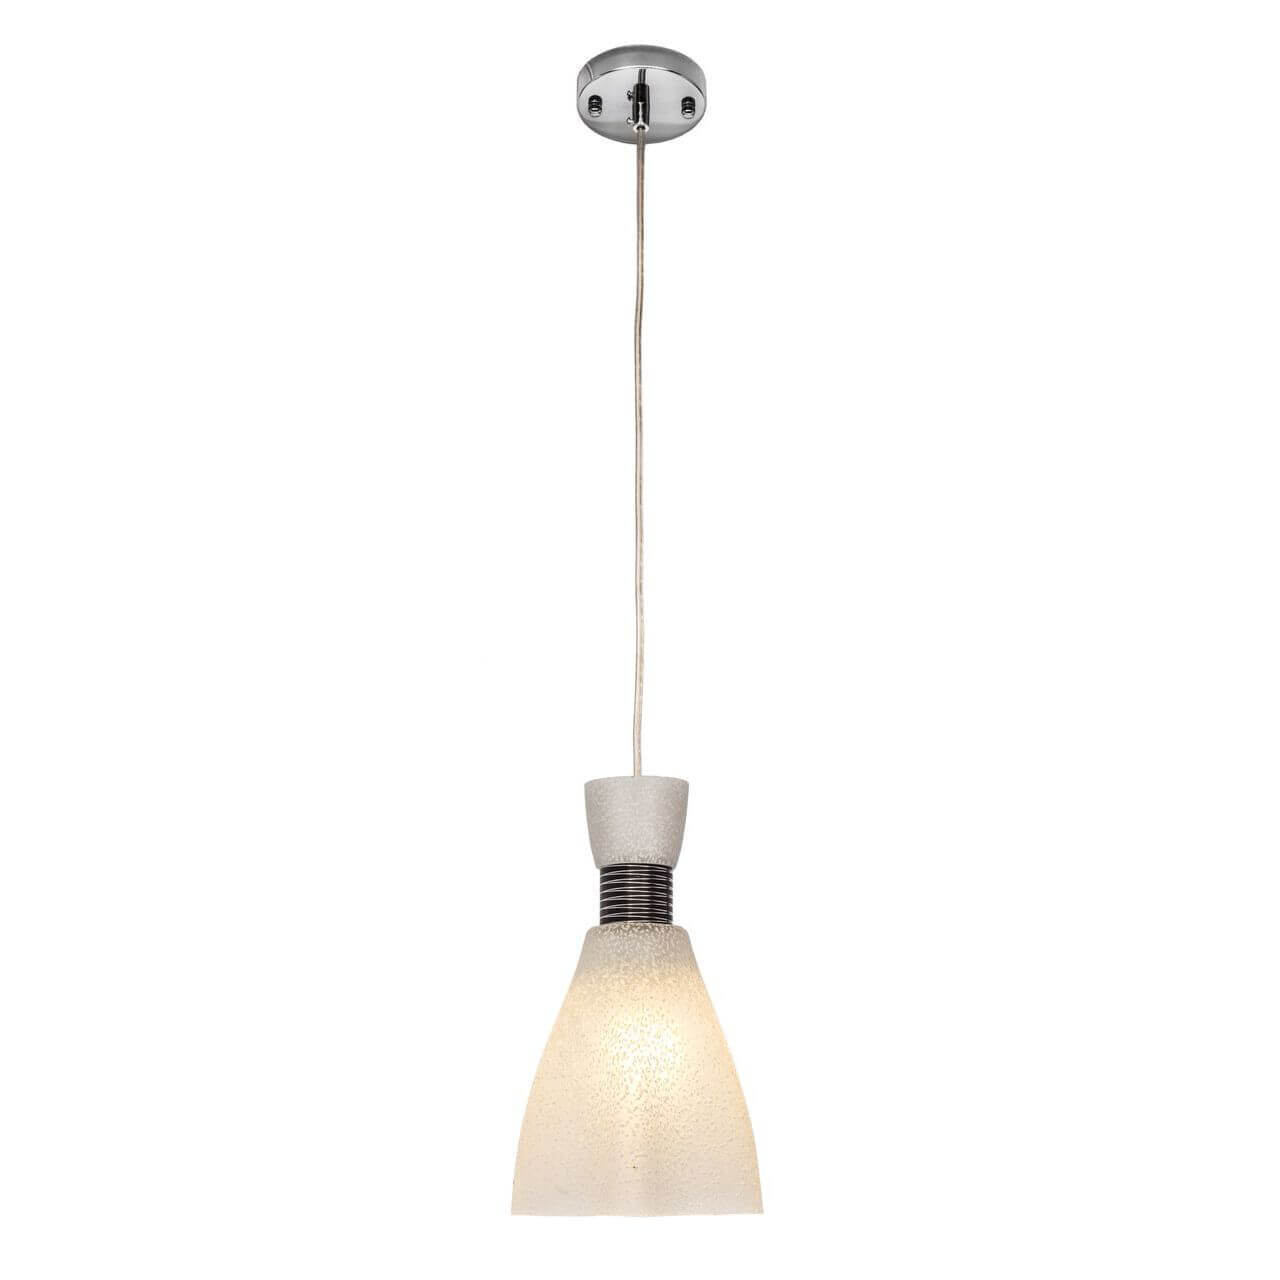 Светильник Silver Light 125.54.1 Alliance